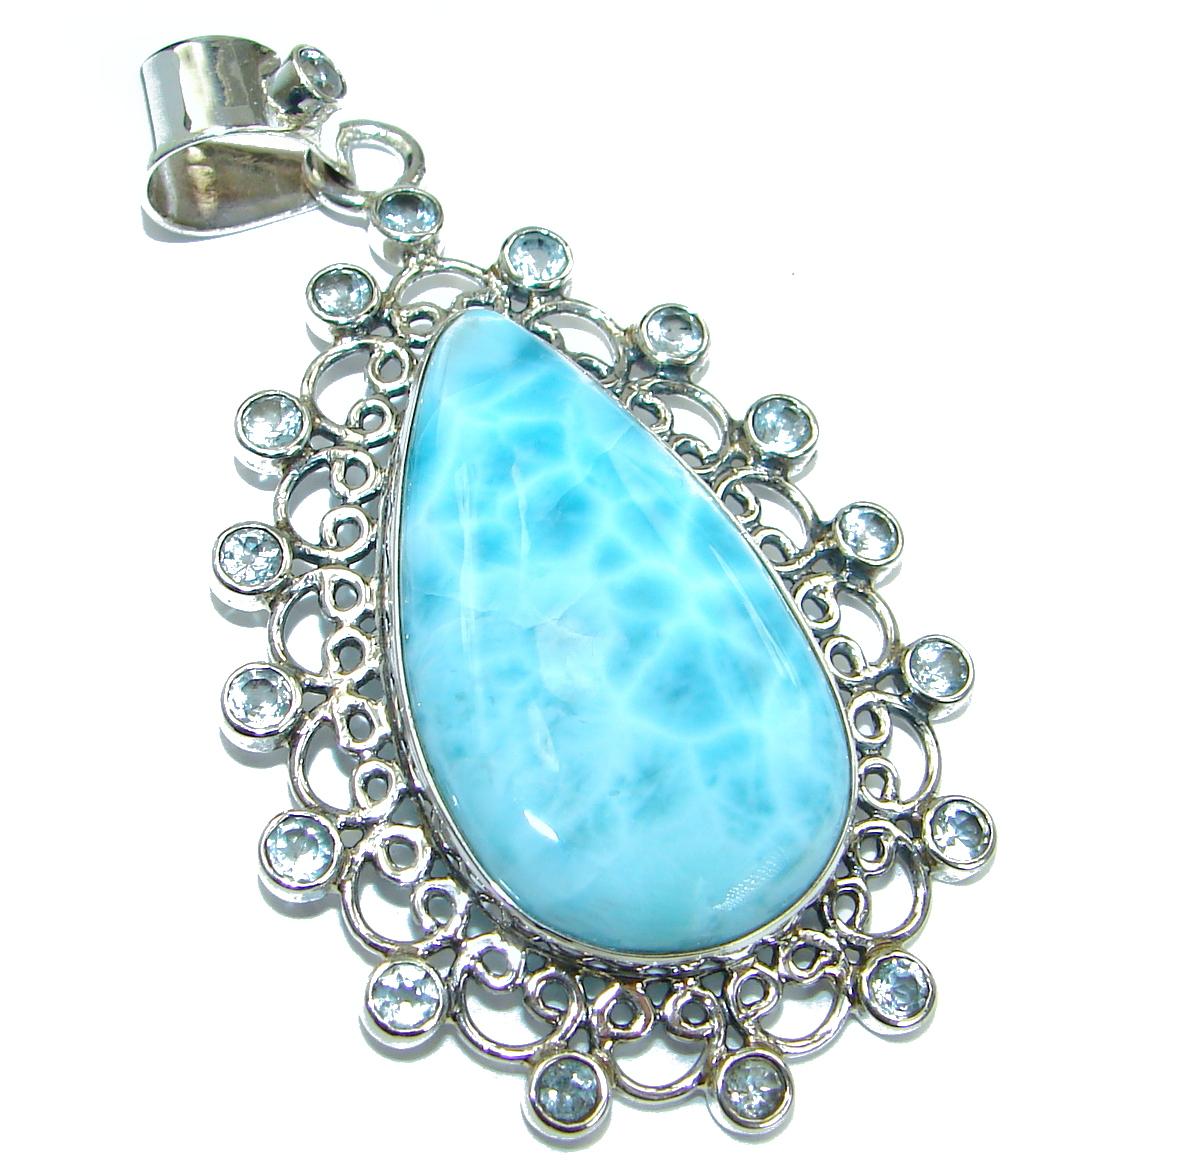 Huge Blue Beauty genuine Larimar .925 Sterling Silver handmade pendant